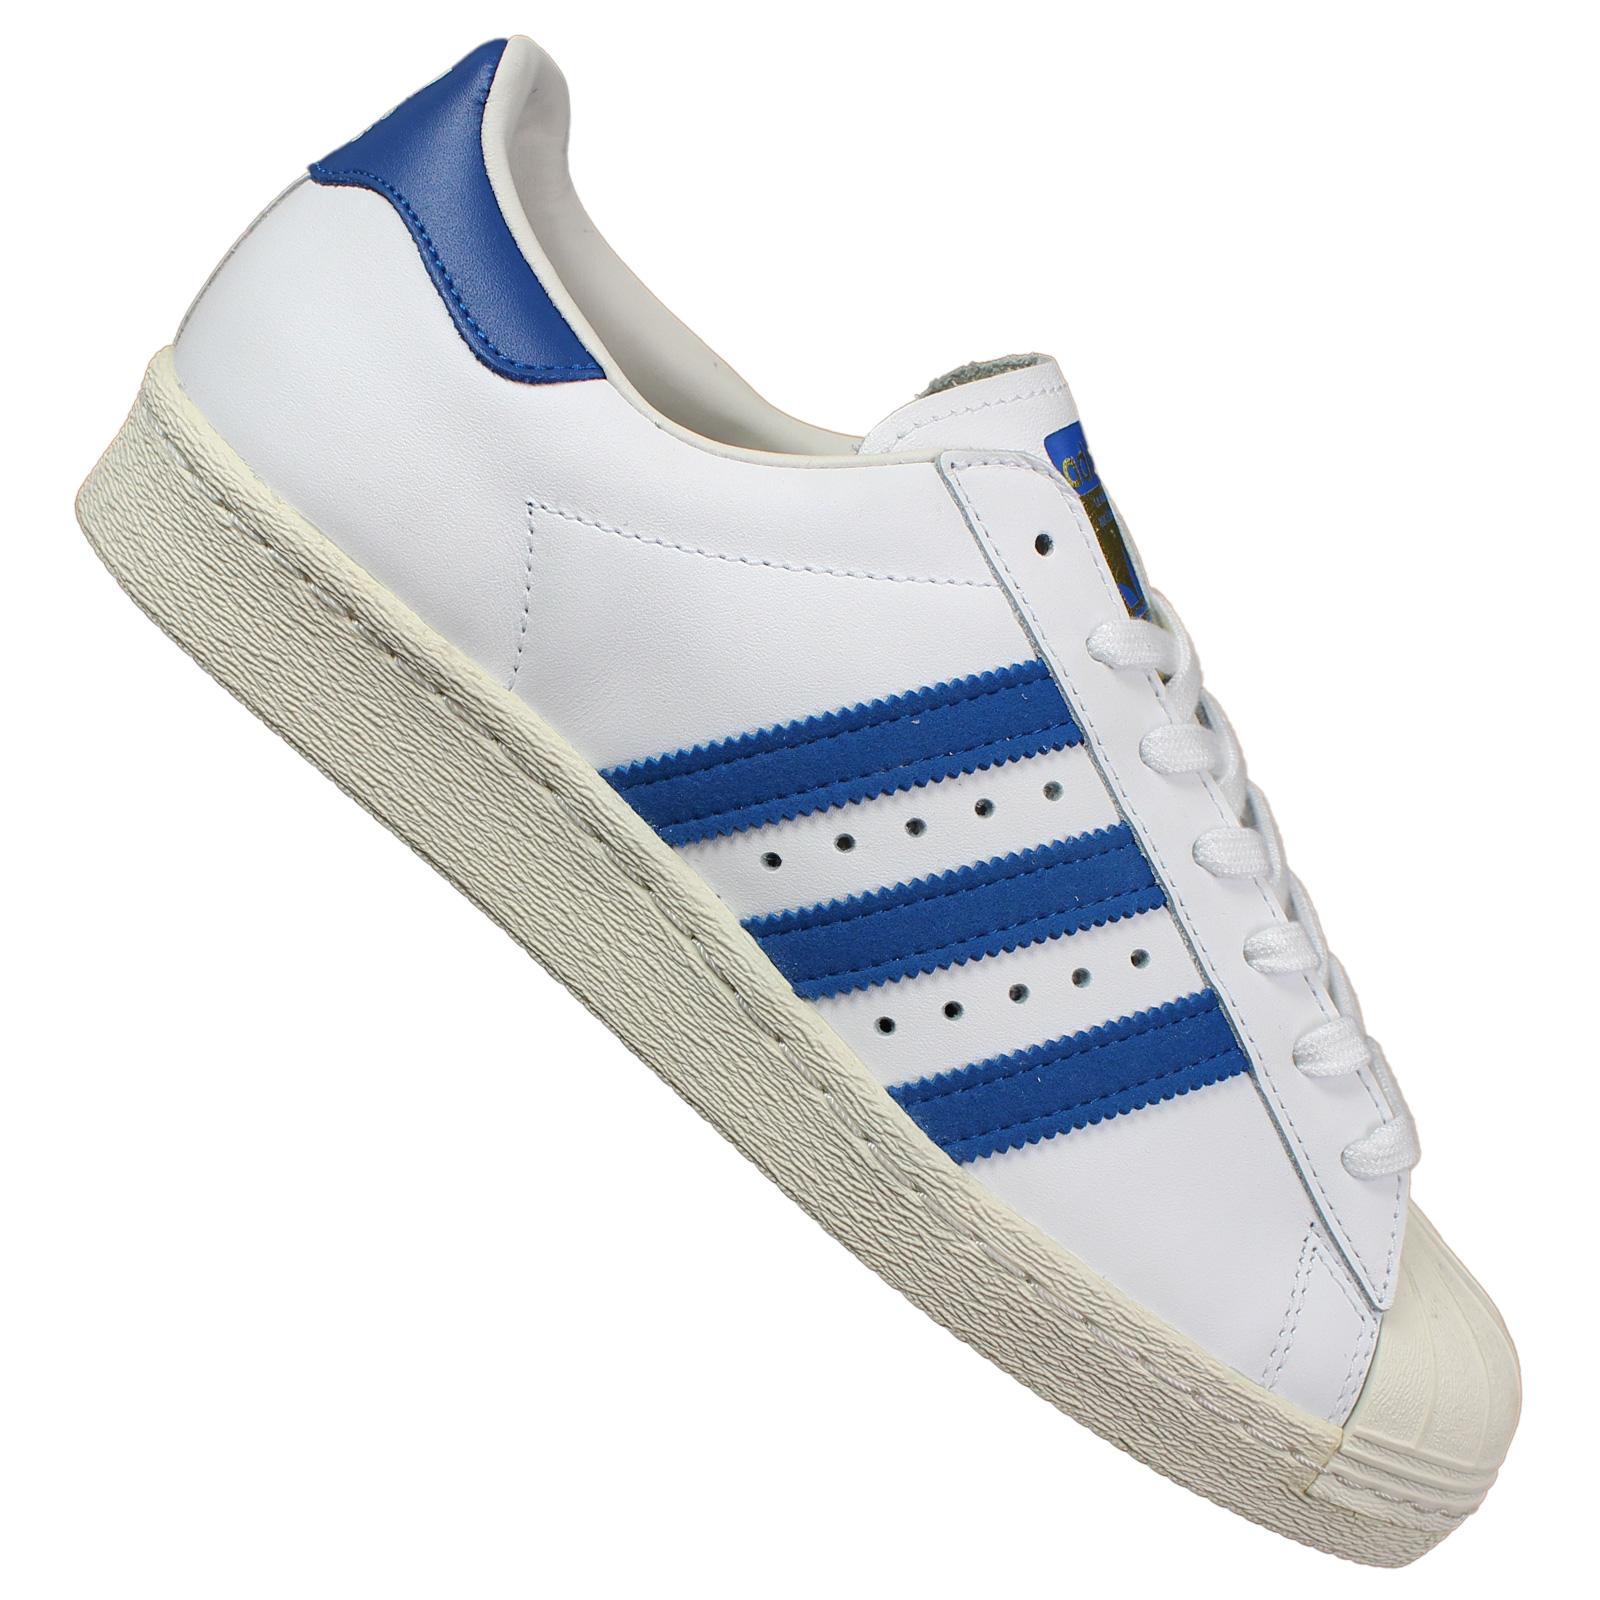 Blau Schuhe Weiss Turnschuhe 80s Herren Sneaker Adidas Originals Leder Superstar ZOuPkiX